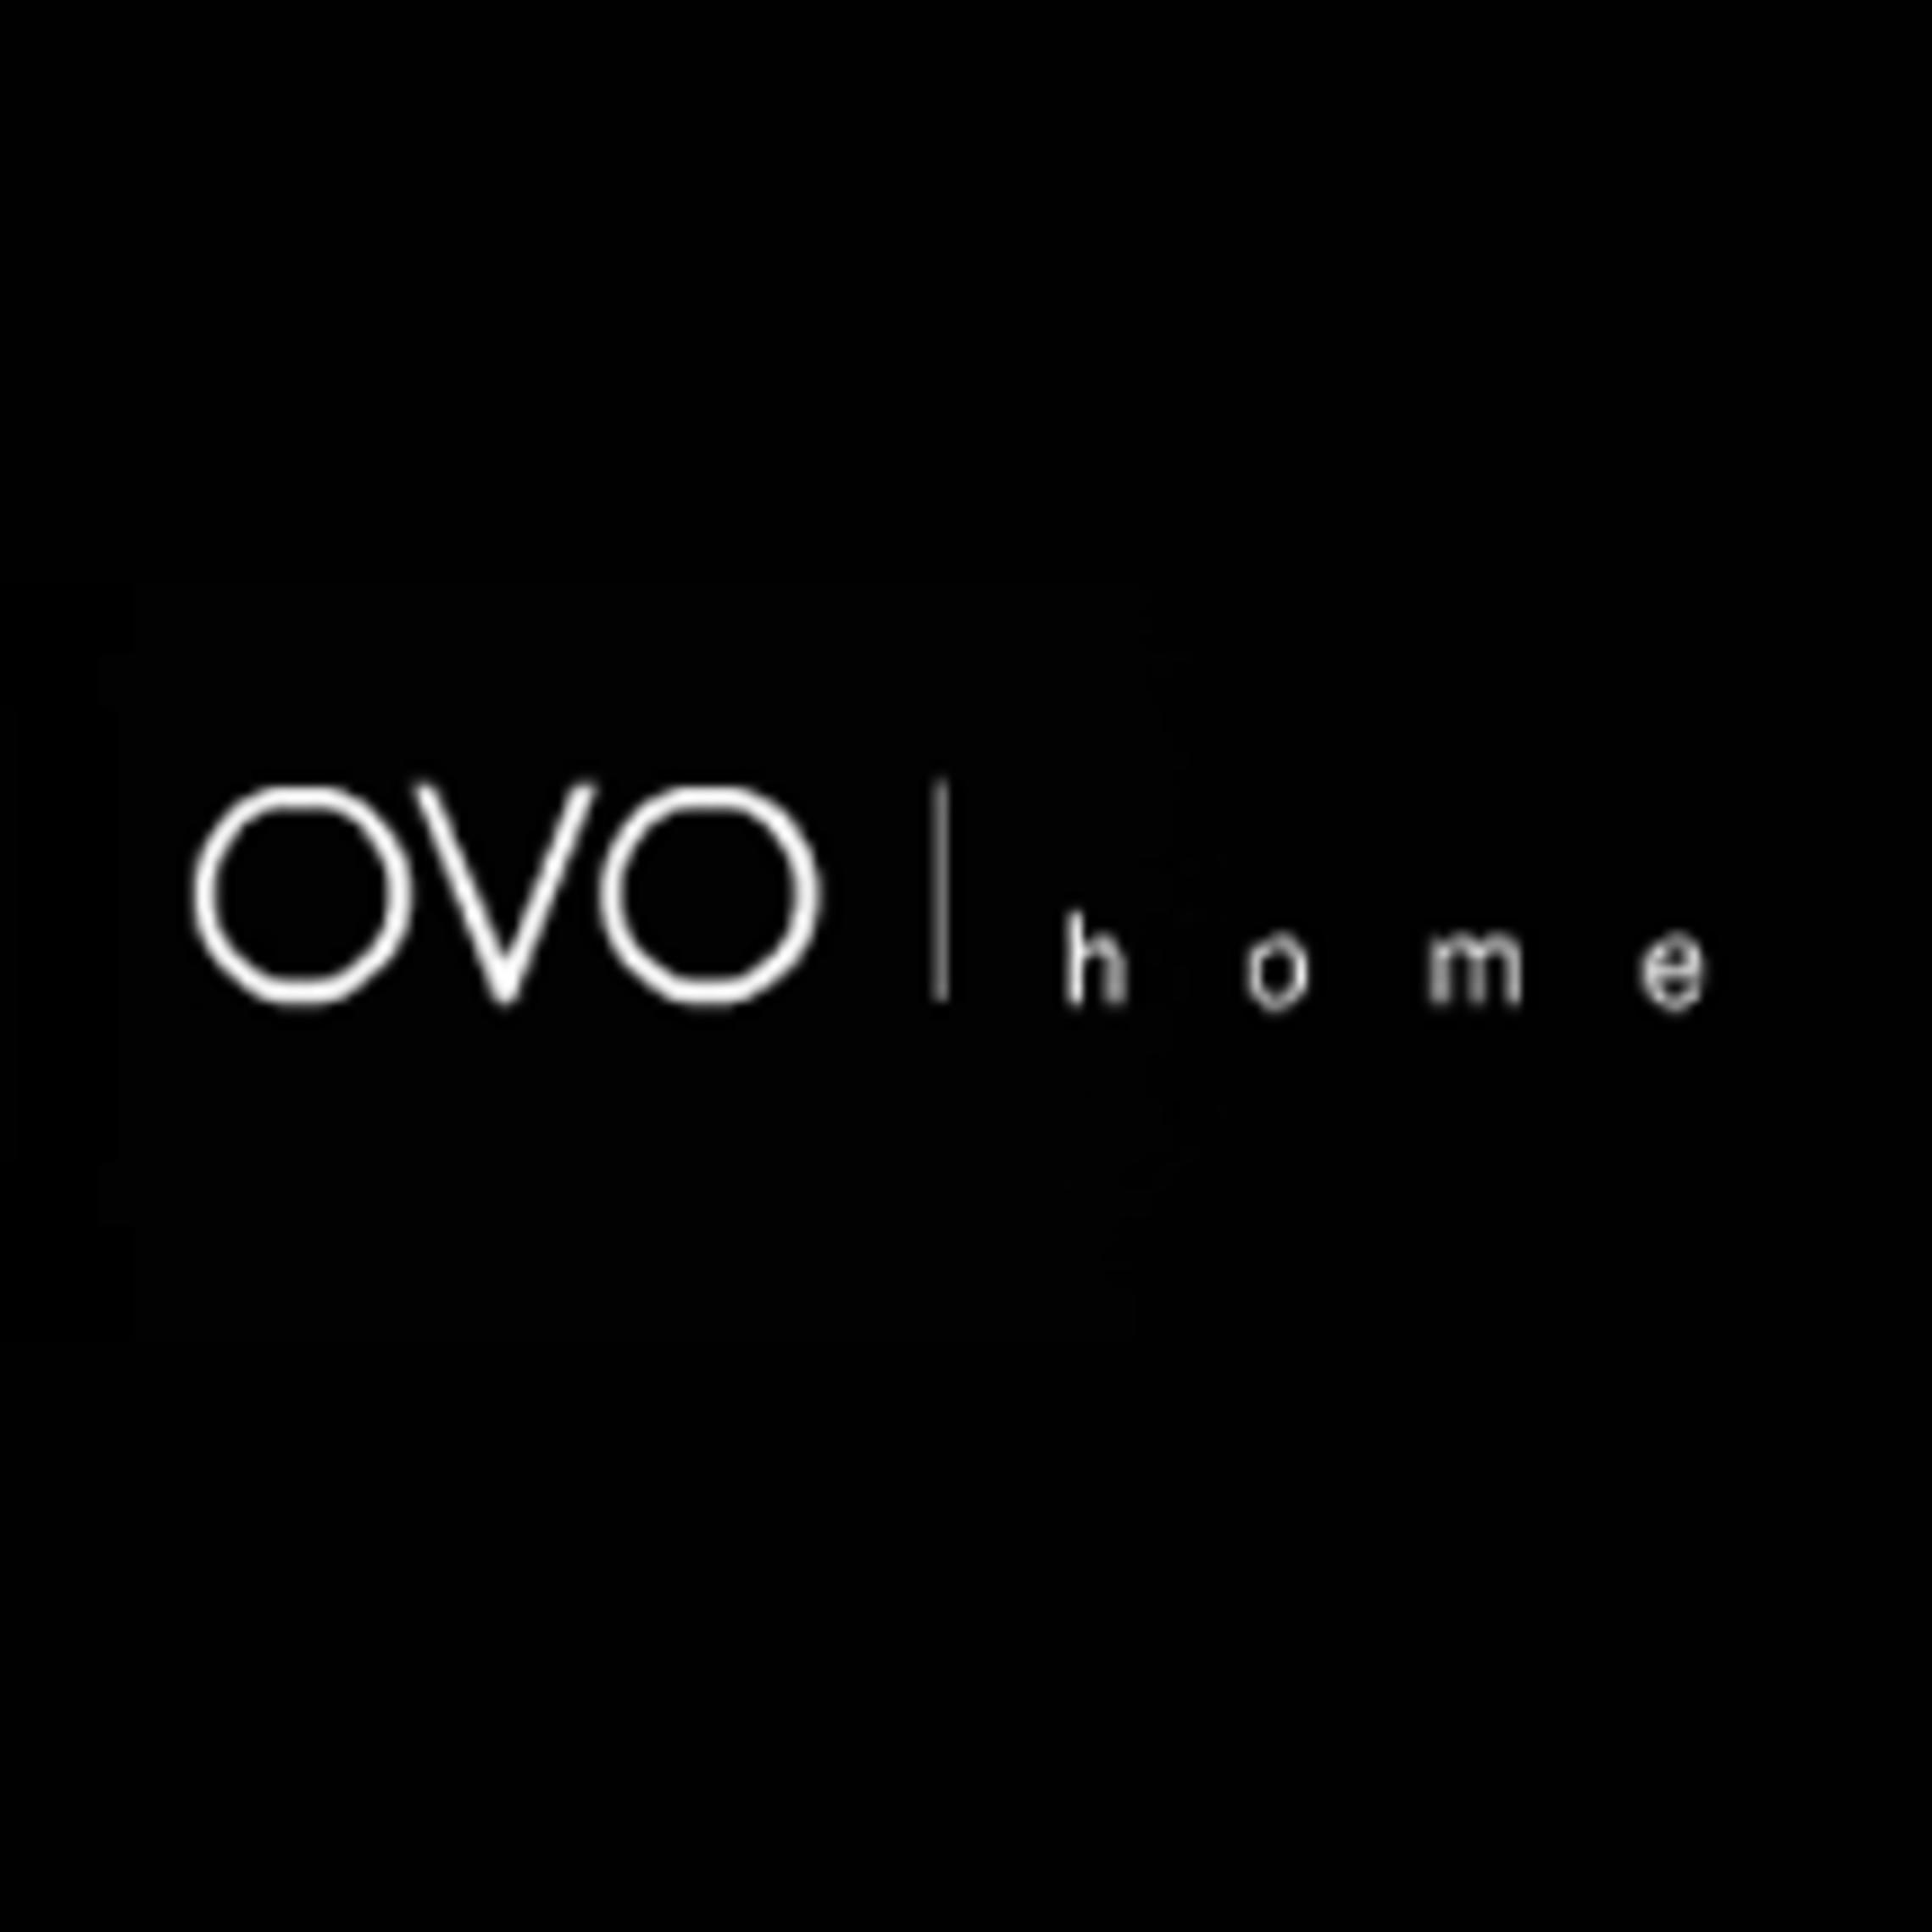 ovo home- company logo